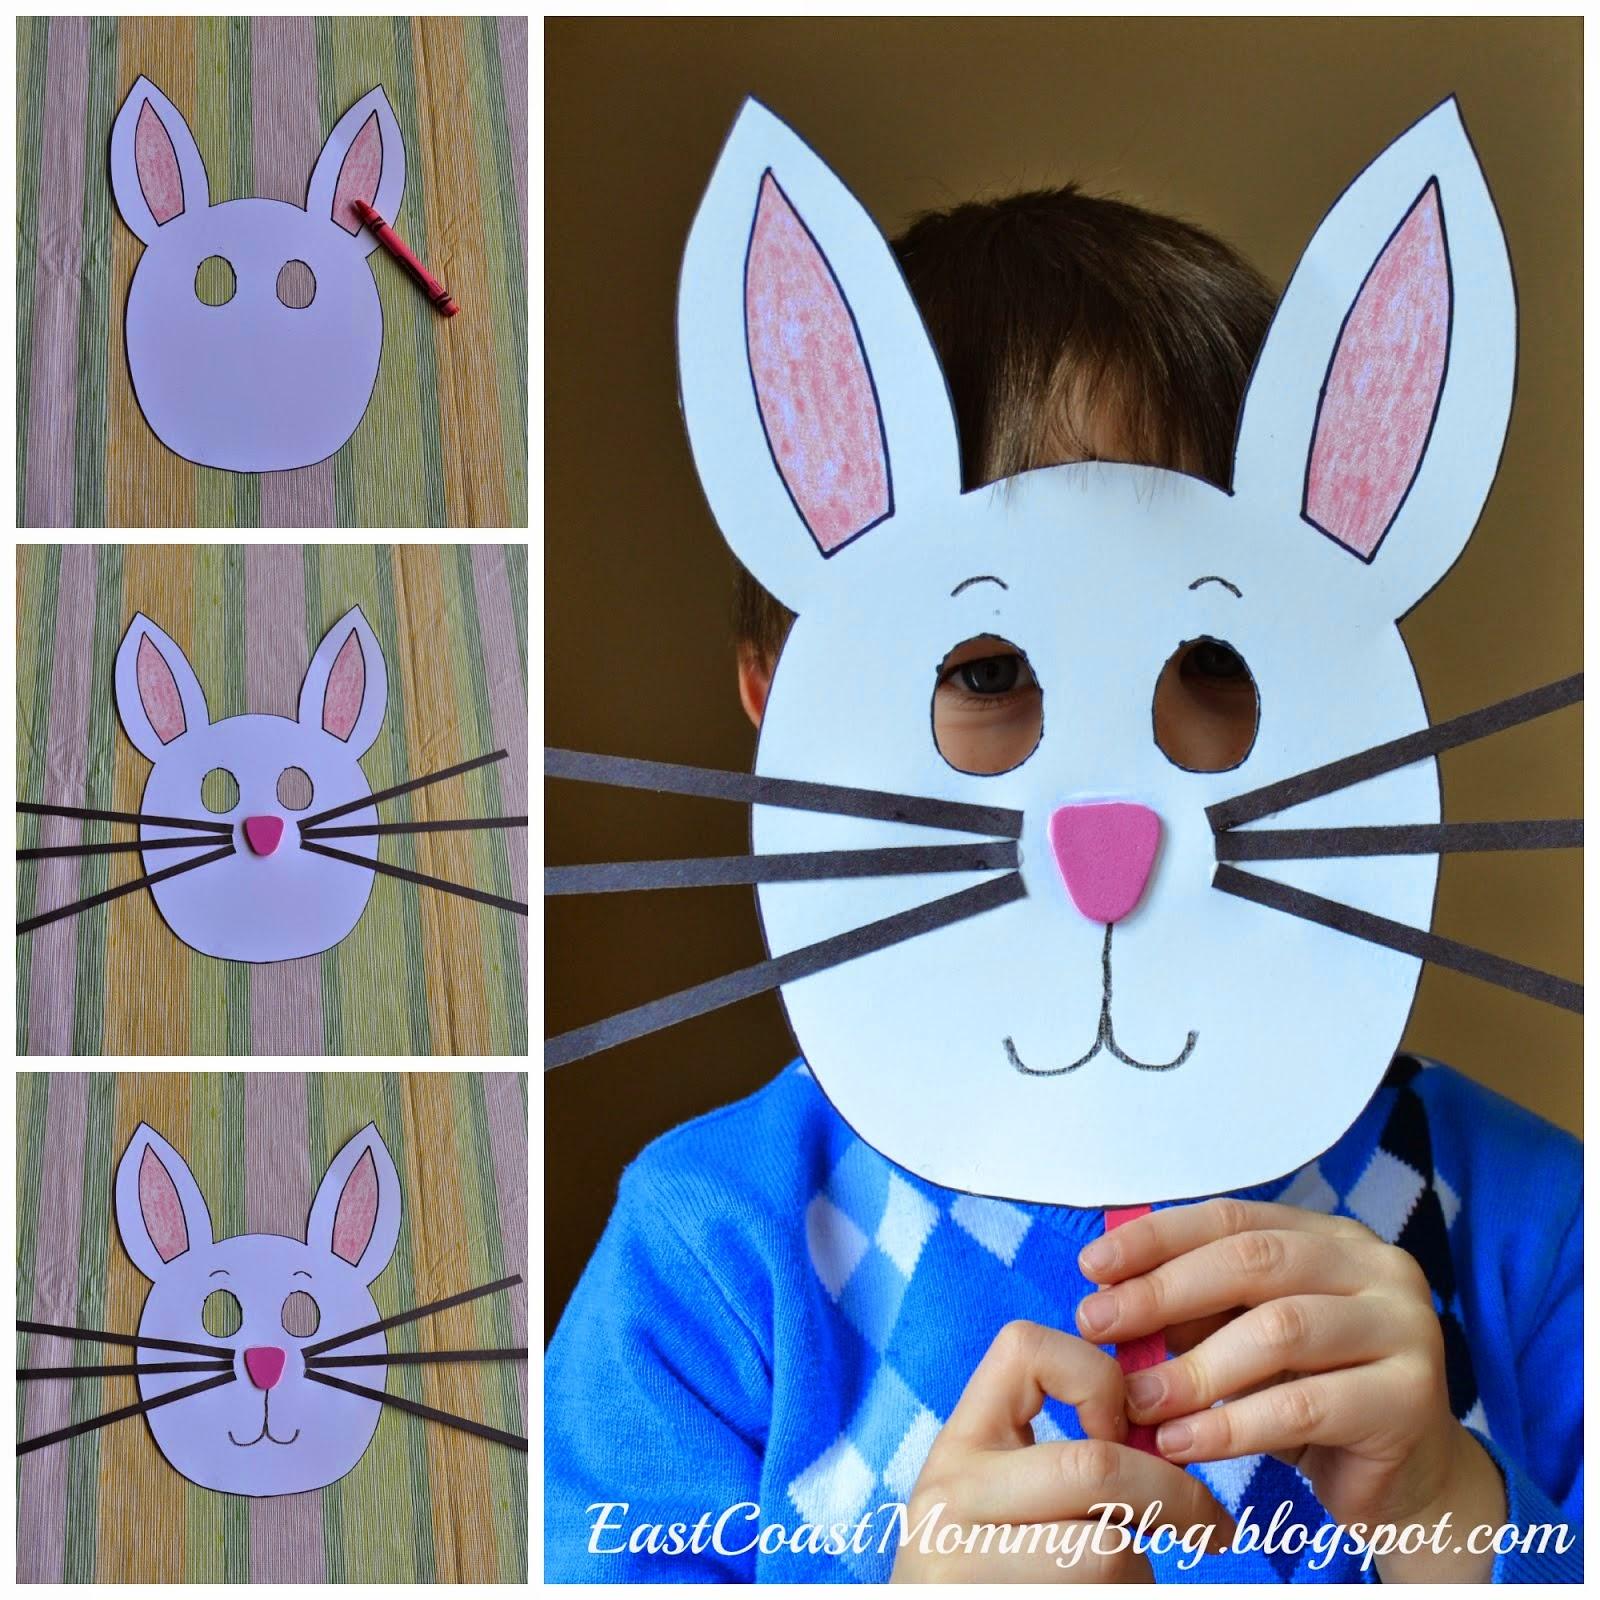 East Coast Mommy: Bunny Mask {Preschool Craft} - Free Printable Easter Masks